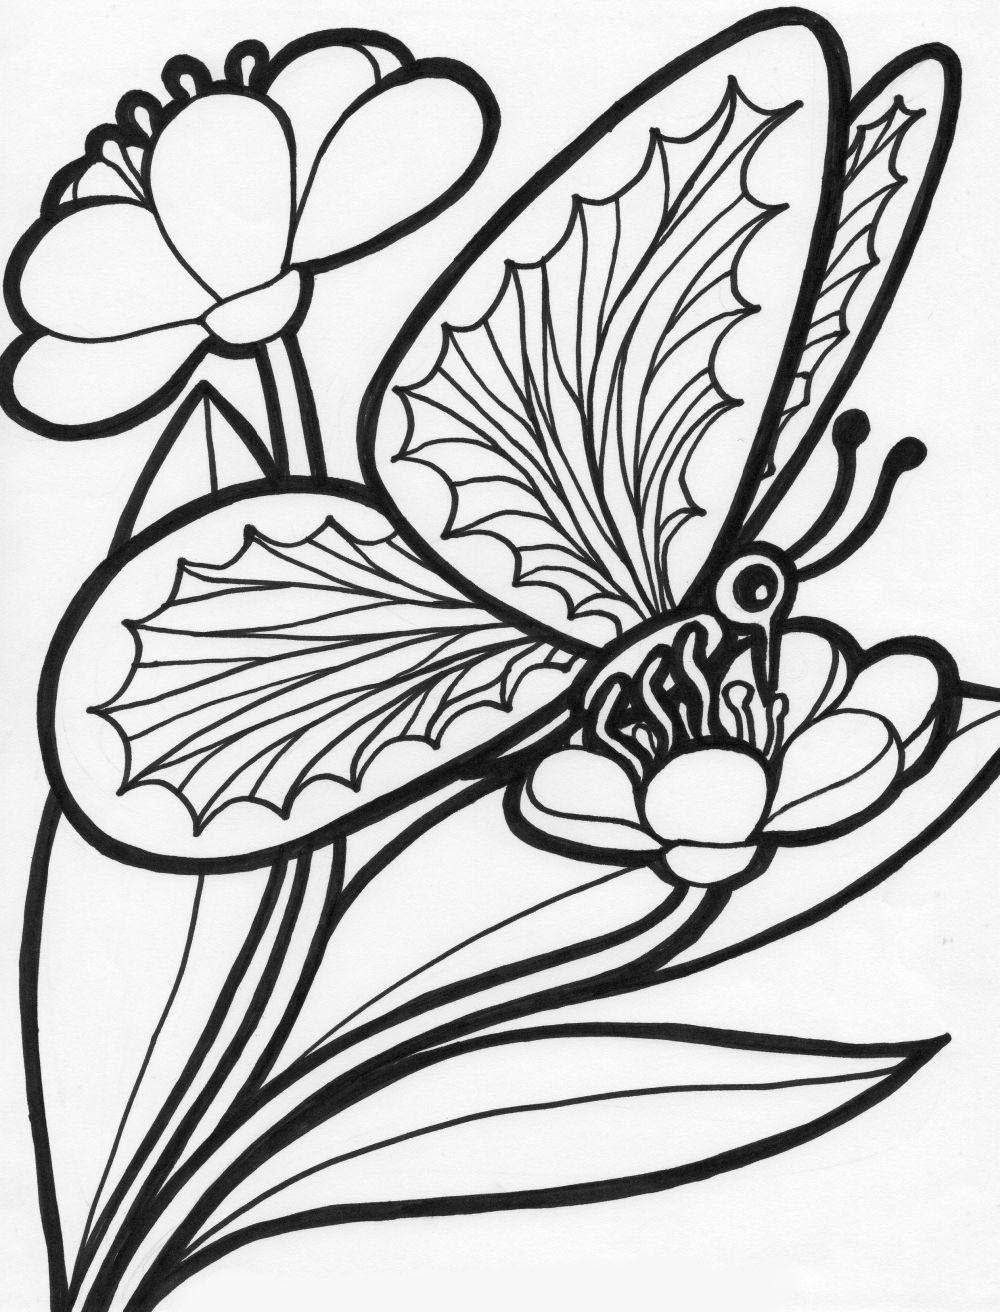 mariposas para imprimir gratis | Printables | Pinterest | Mariposas ...